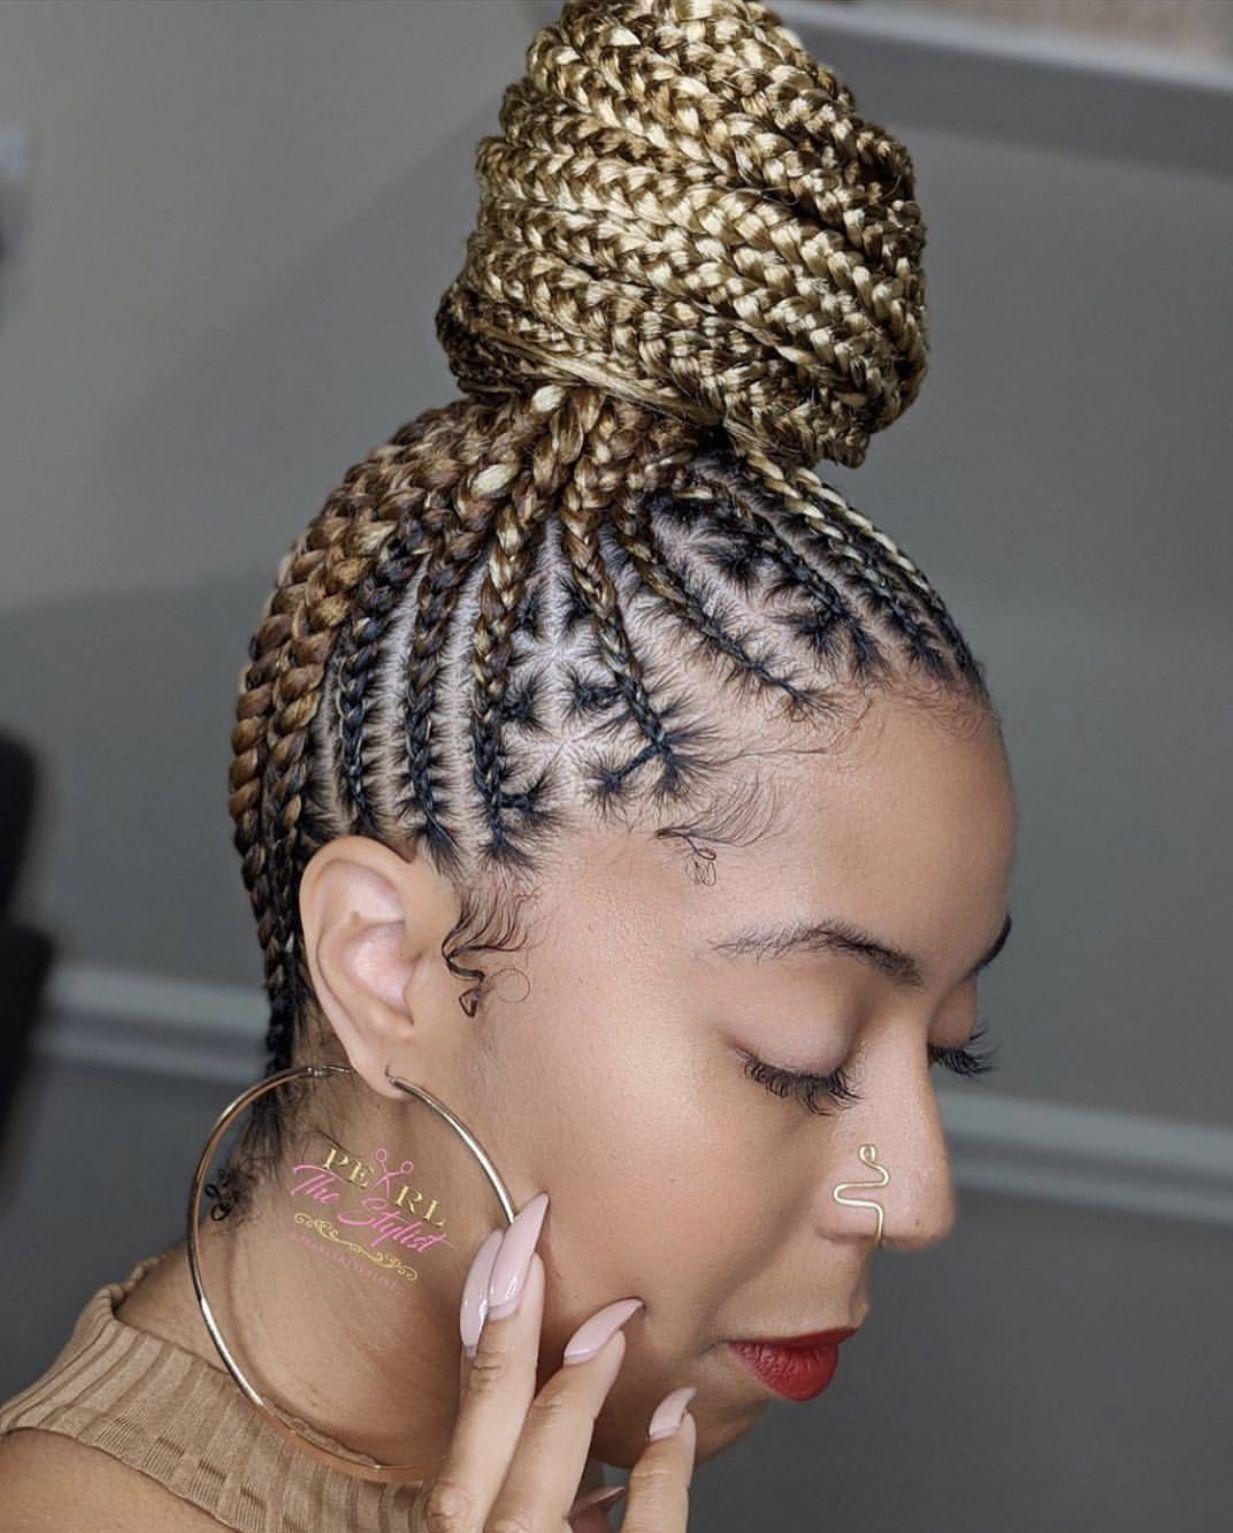 Cornrows Bun Hairstyle 2020 Hair Styles Braided Hairstyles Natural Hair Styles